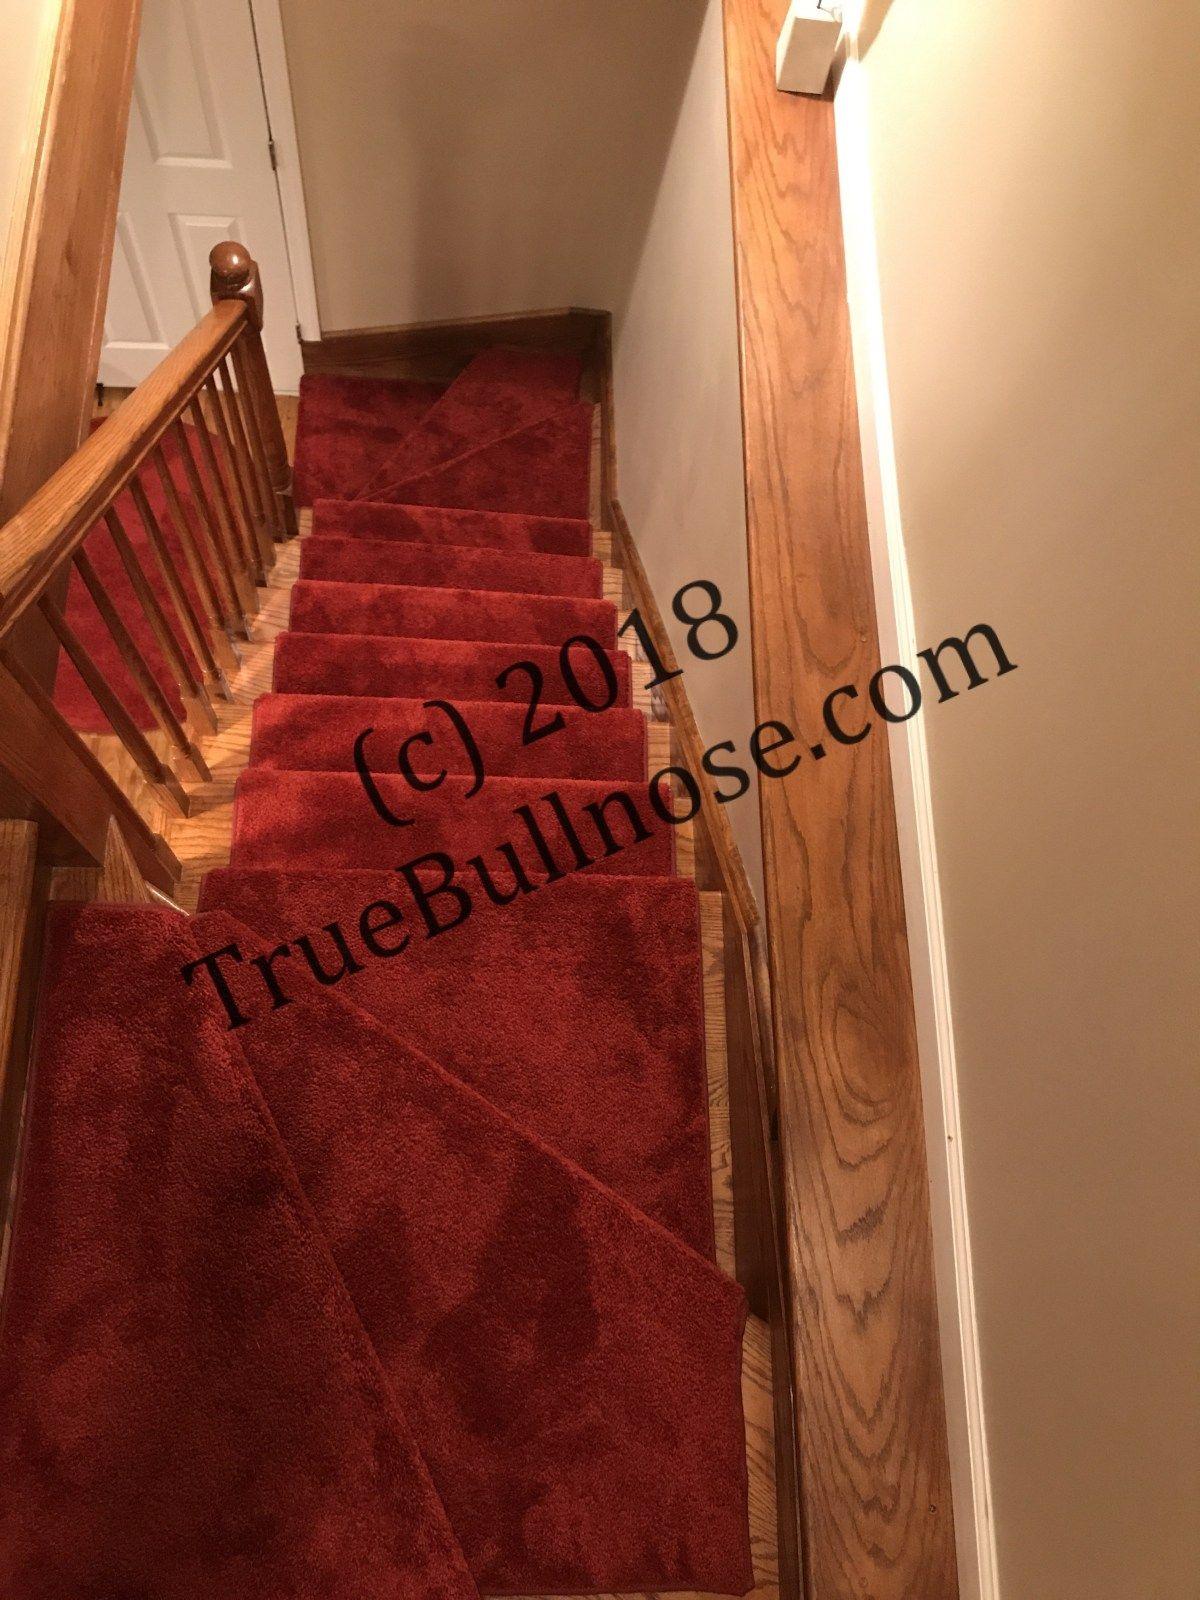 True Bullnose™ Photos True Bullnose™ And True Flat™ Padded   True Bullnose Stair Treads   Rug Runner   Stair Runner   Flooring   Basement Stairs   Comfort Safety